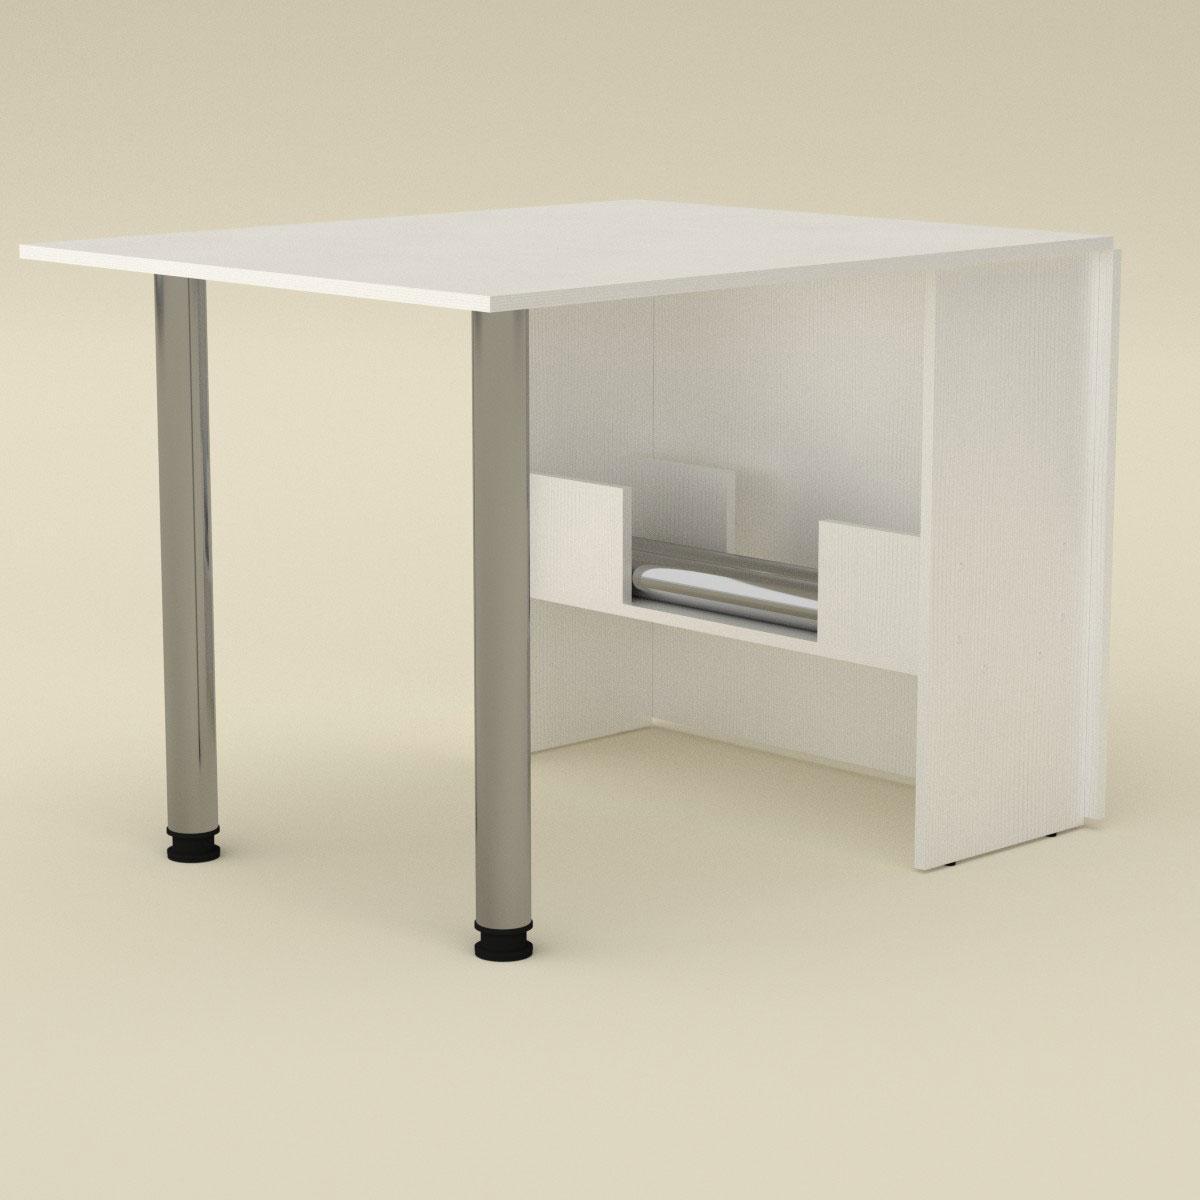 Стол книжка–2 Компанит